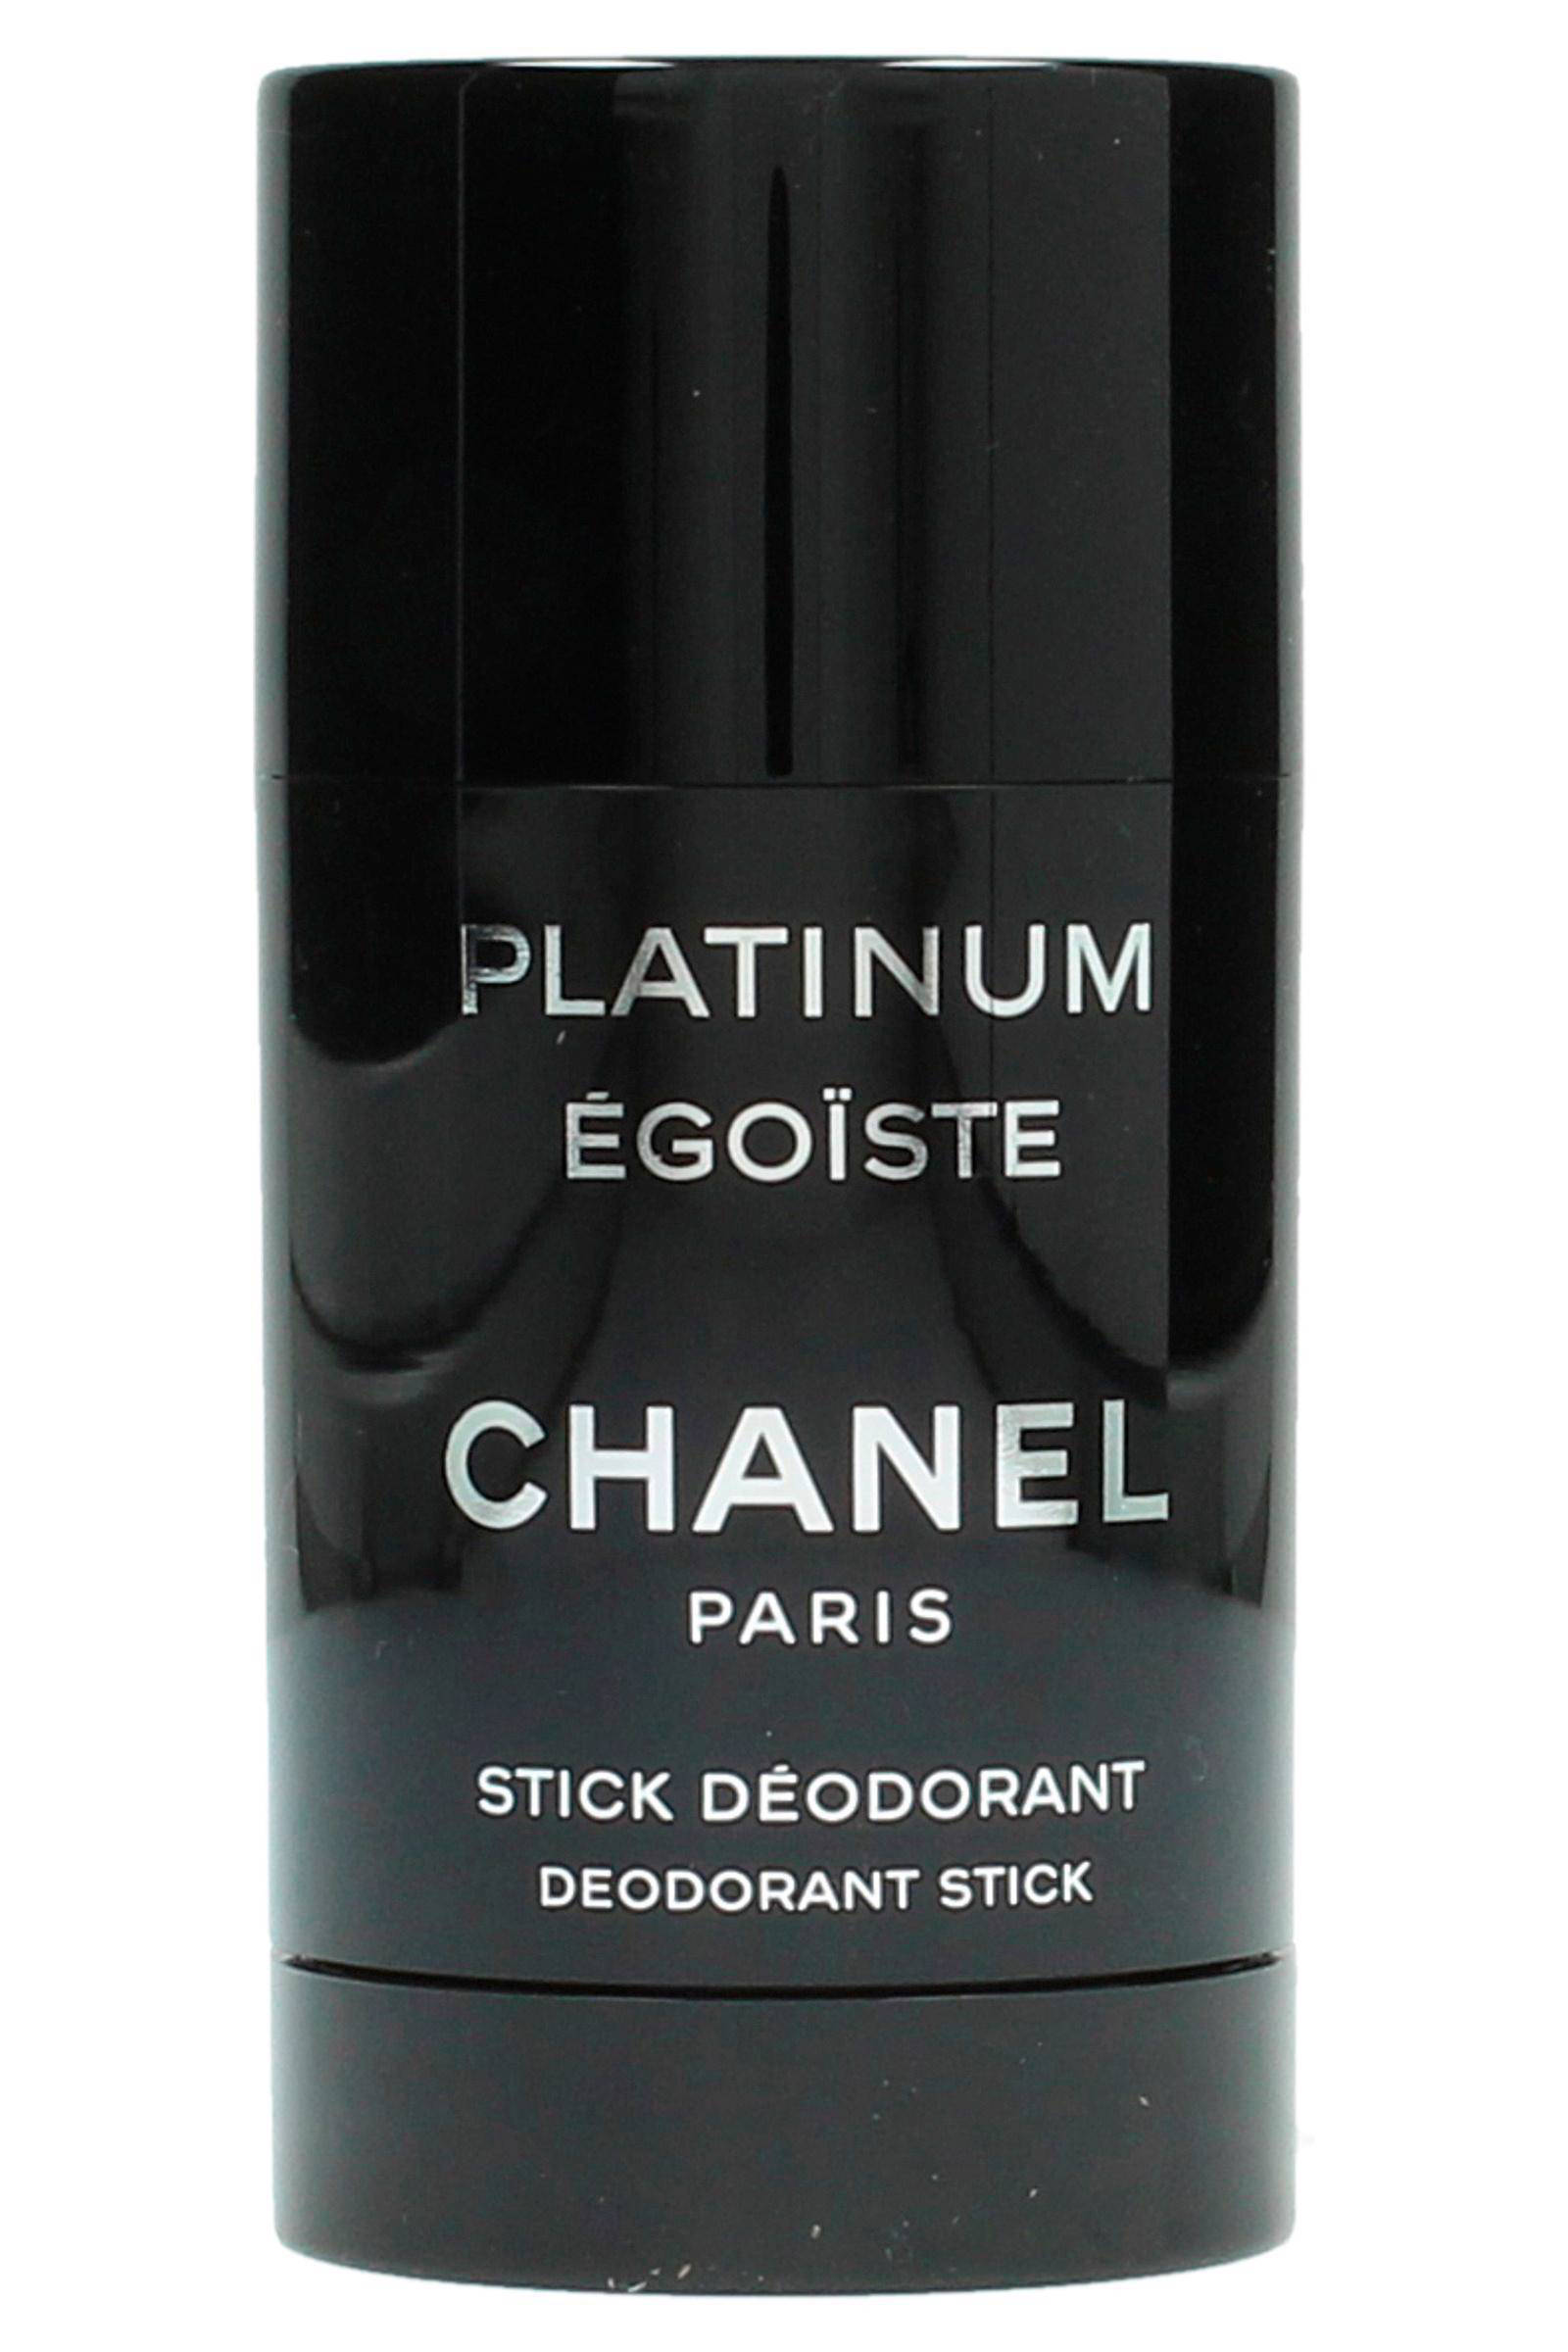 Chanel Egoïste Platinum deodorant stick - 75 ml